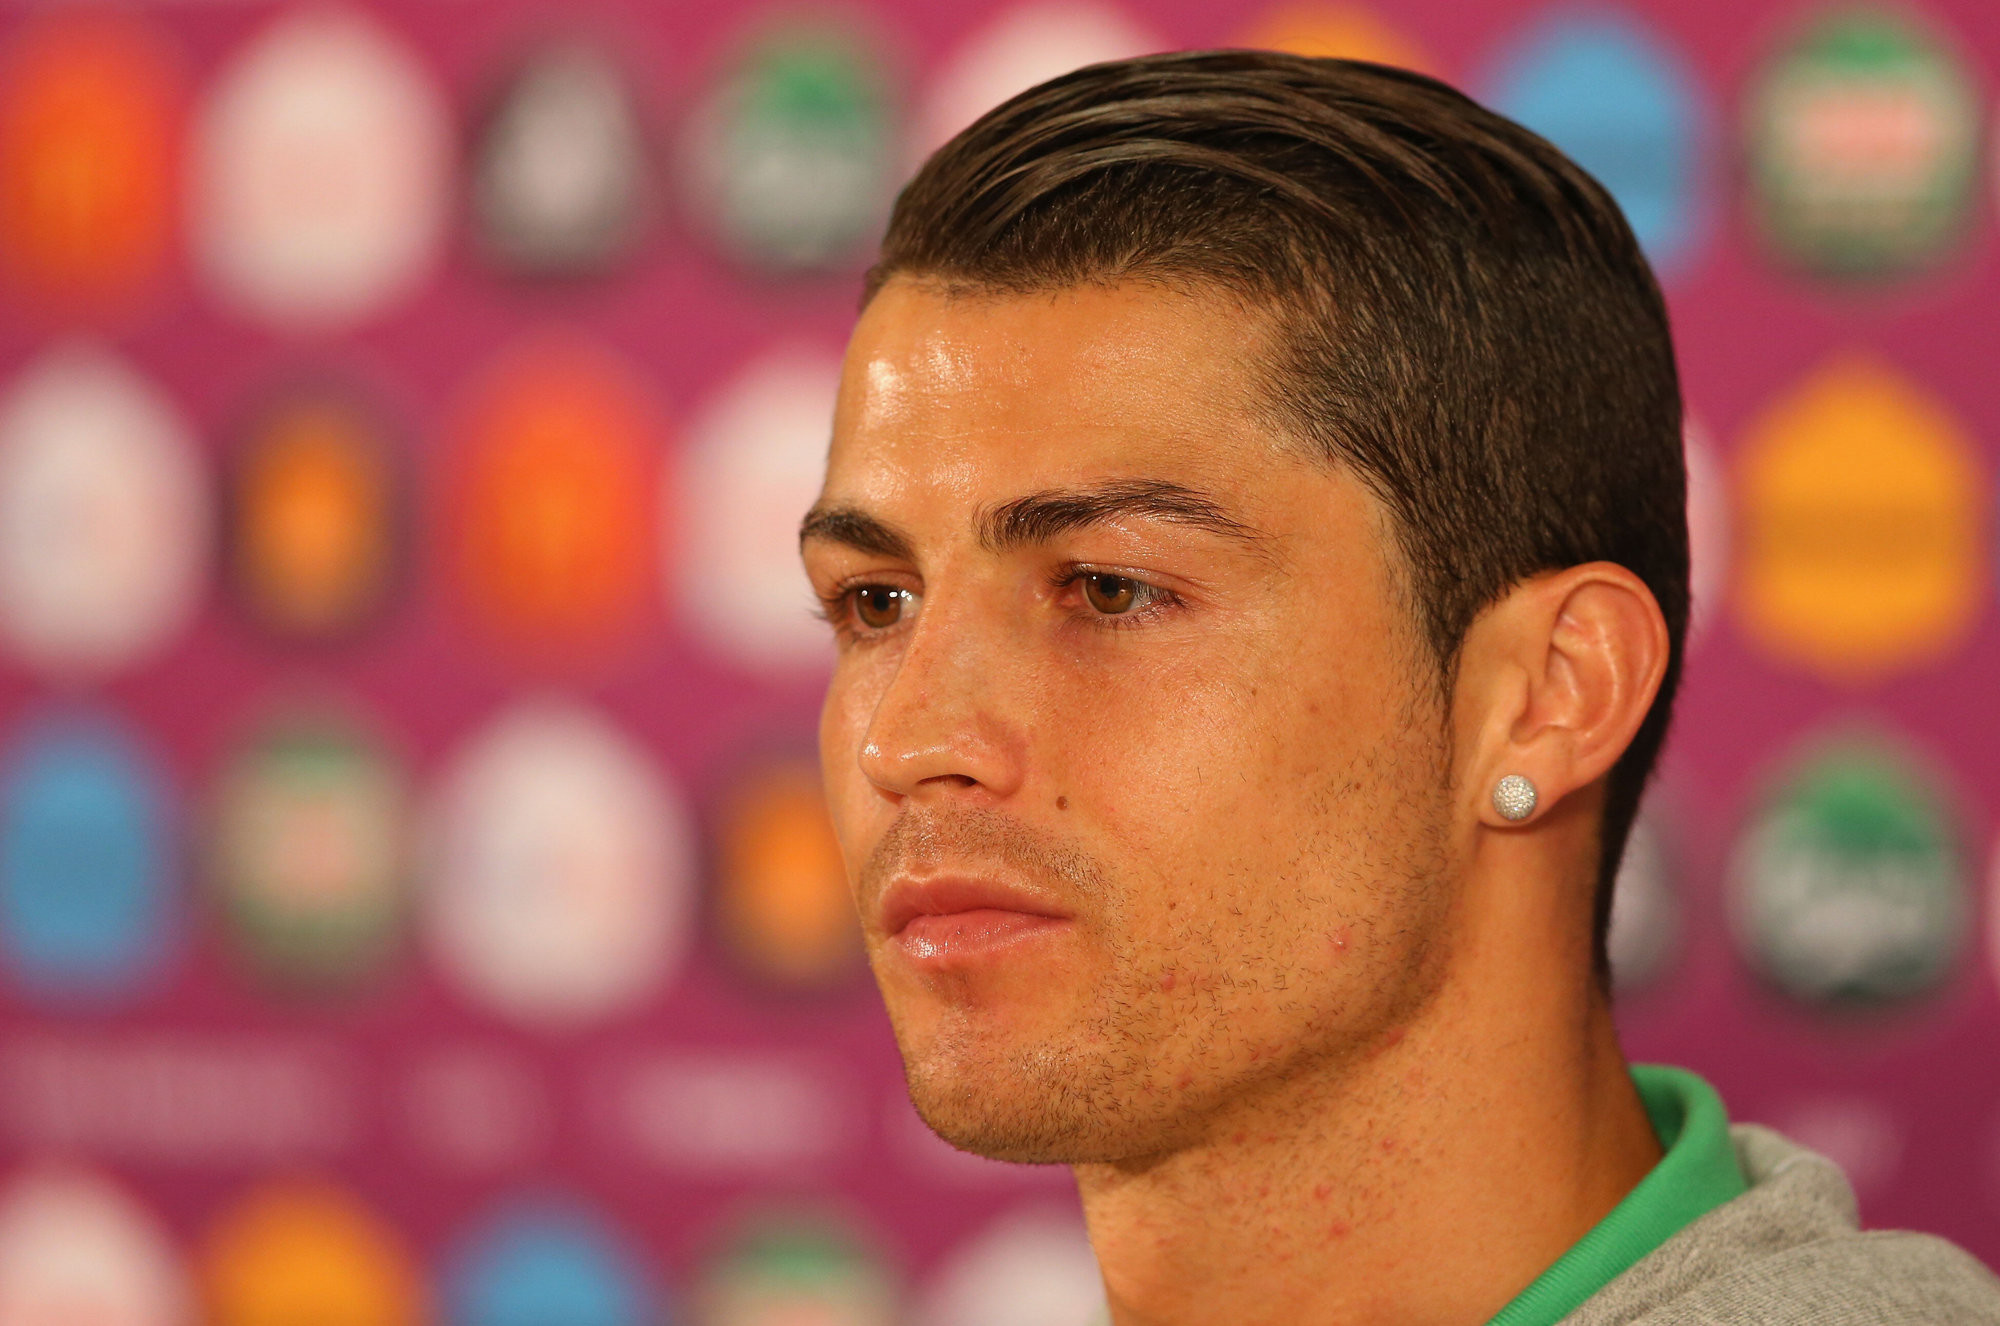 Cristiano Ronaldo New Hairstyles 2014